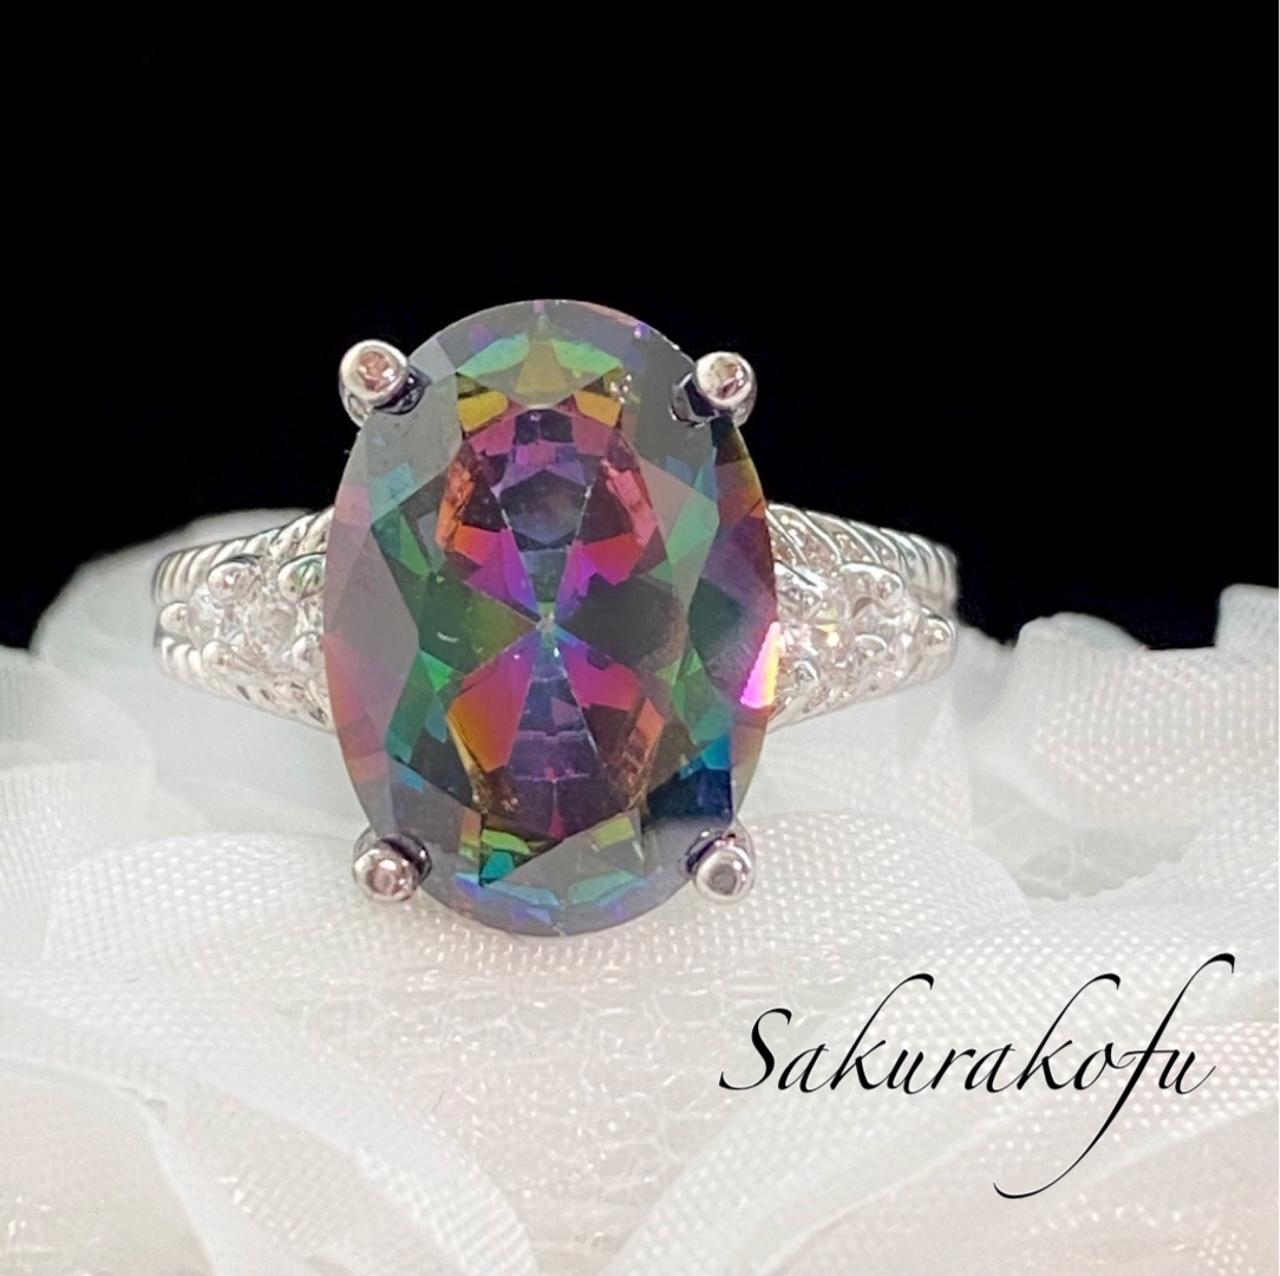 D077 レディース リング 指輪 ミスティックトパーズ キュービックジルコニア 大粒 ファッションリング